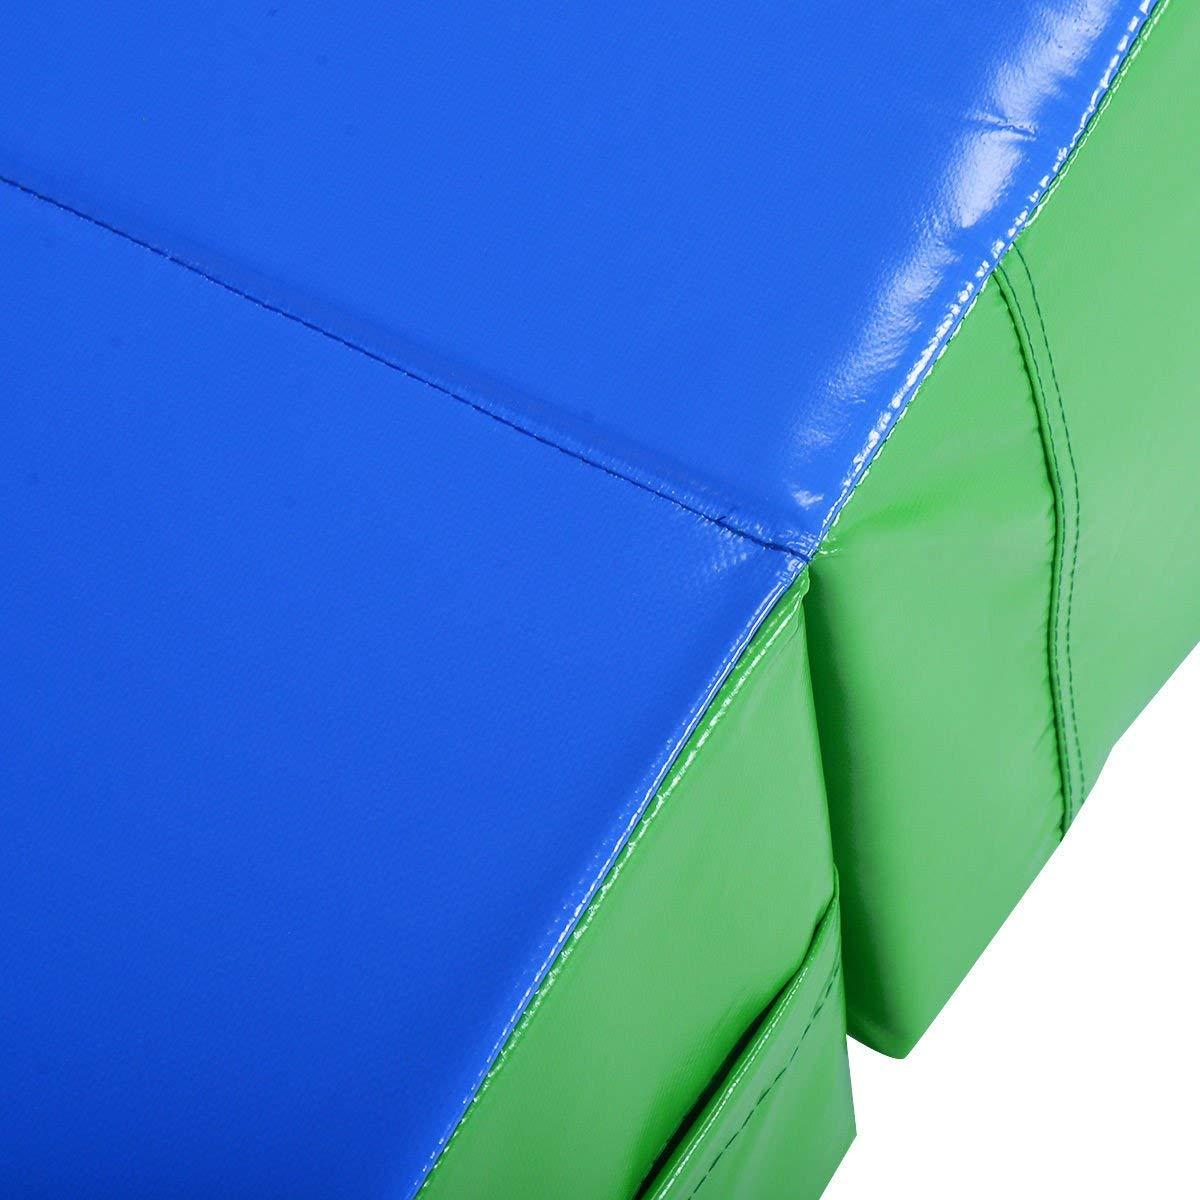 Giantex Incline Gymnastics Mat Wedge Folding and Non-Folding Gymnastics Gym Fitness Skill Shape Tumbling Mat for Kids Play Home Exercise Aerobics (Green/Blue)